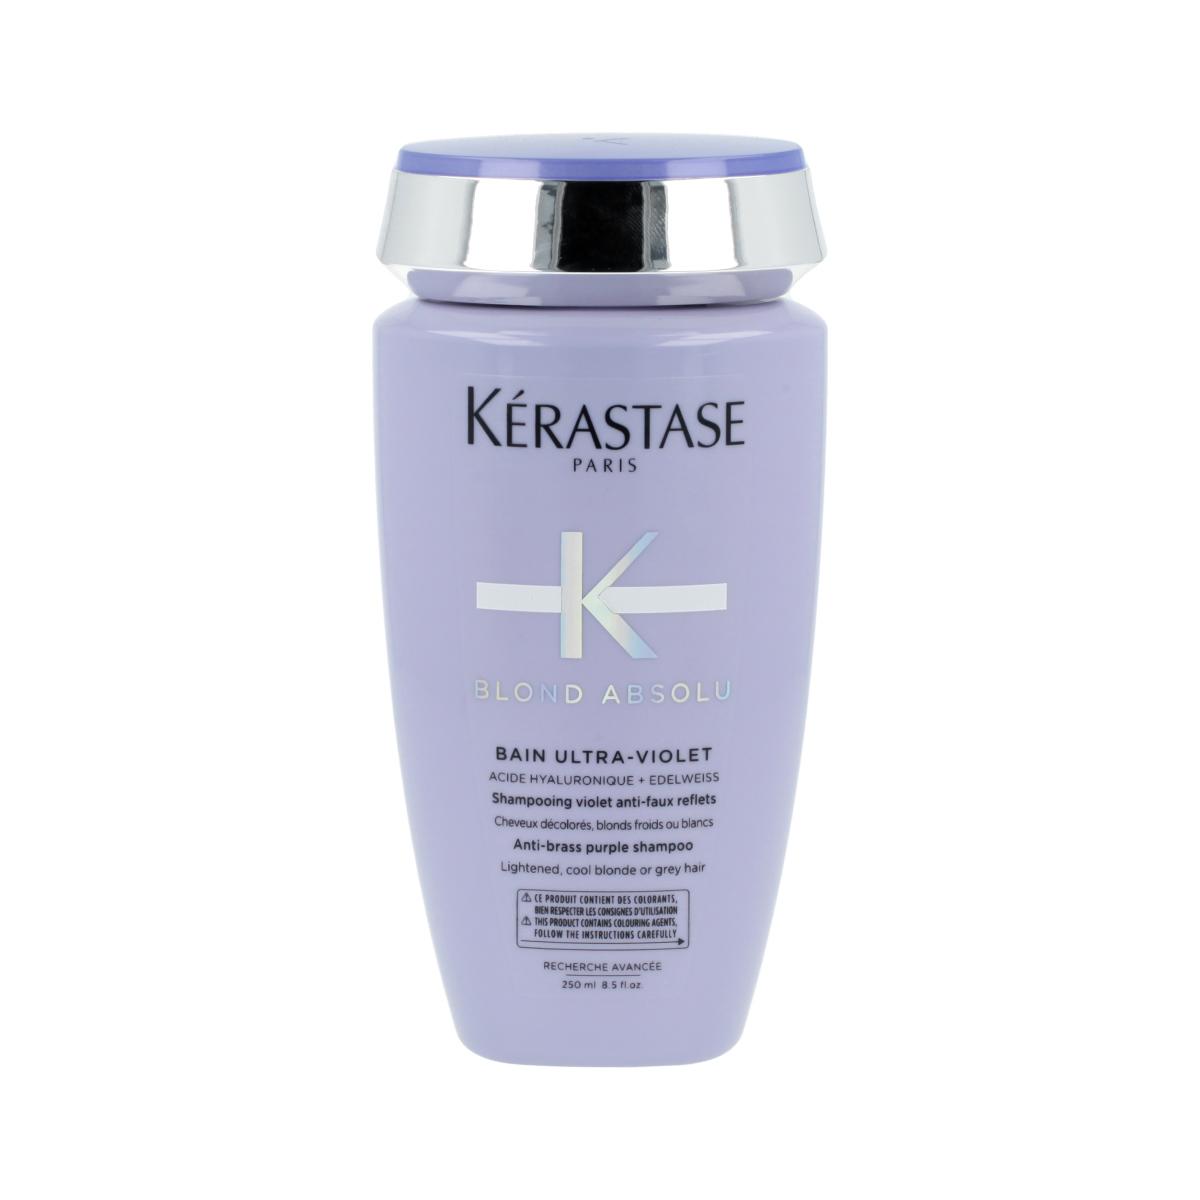 Kérastase Paris Kérastase Blond Absolu Bain Ultra-Violet Shampoo 250 ml 13468